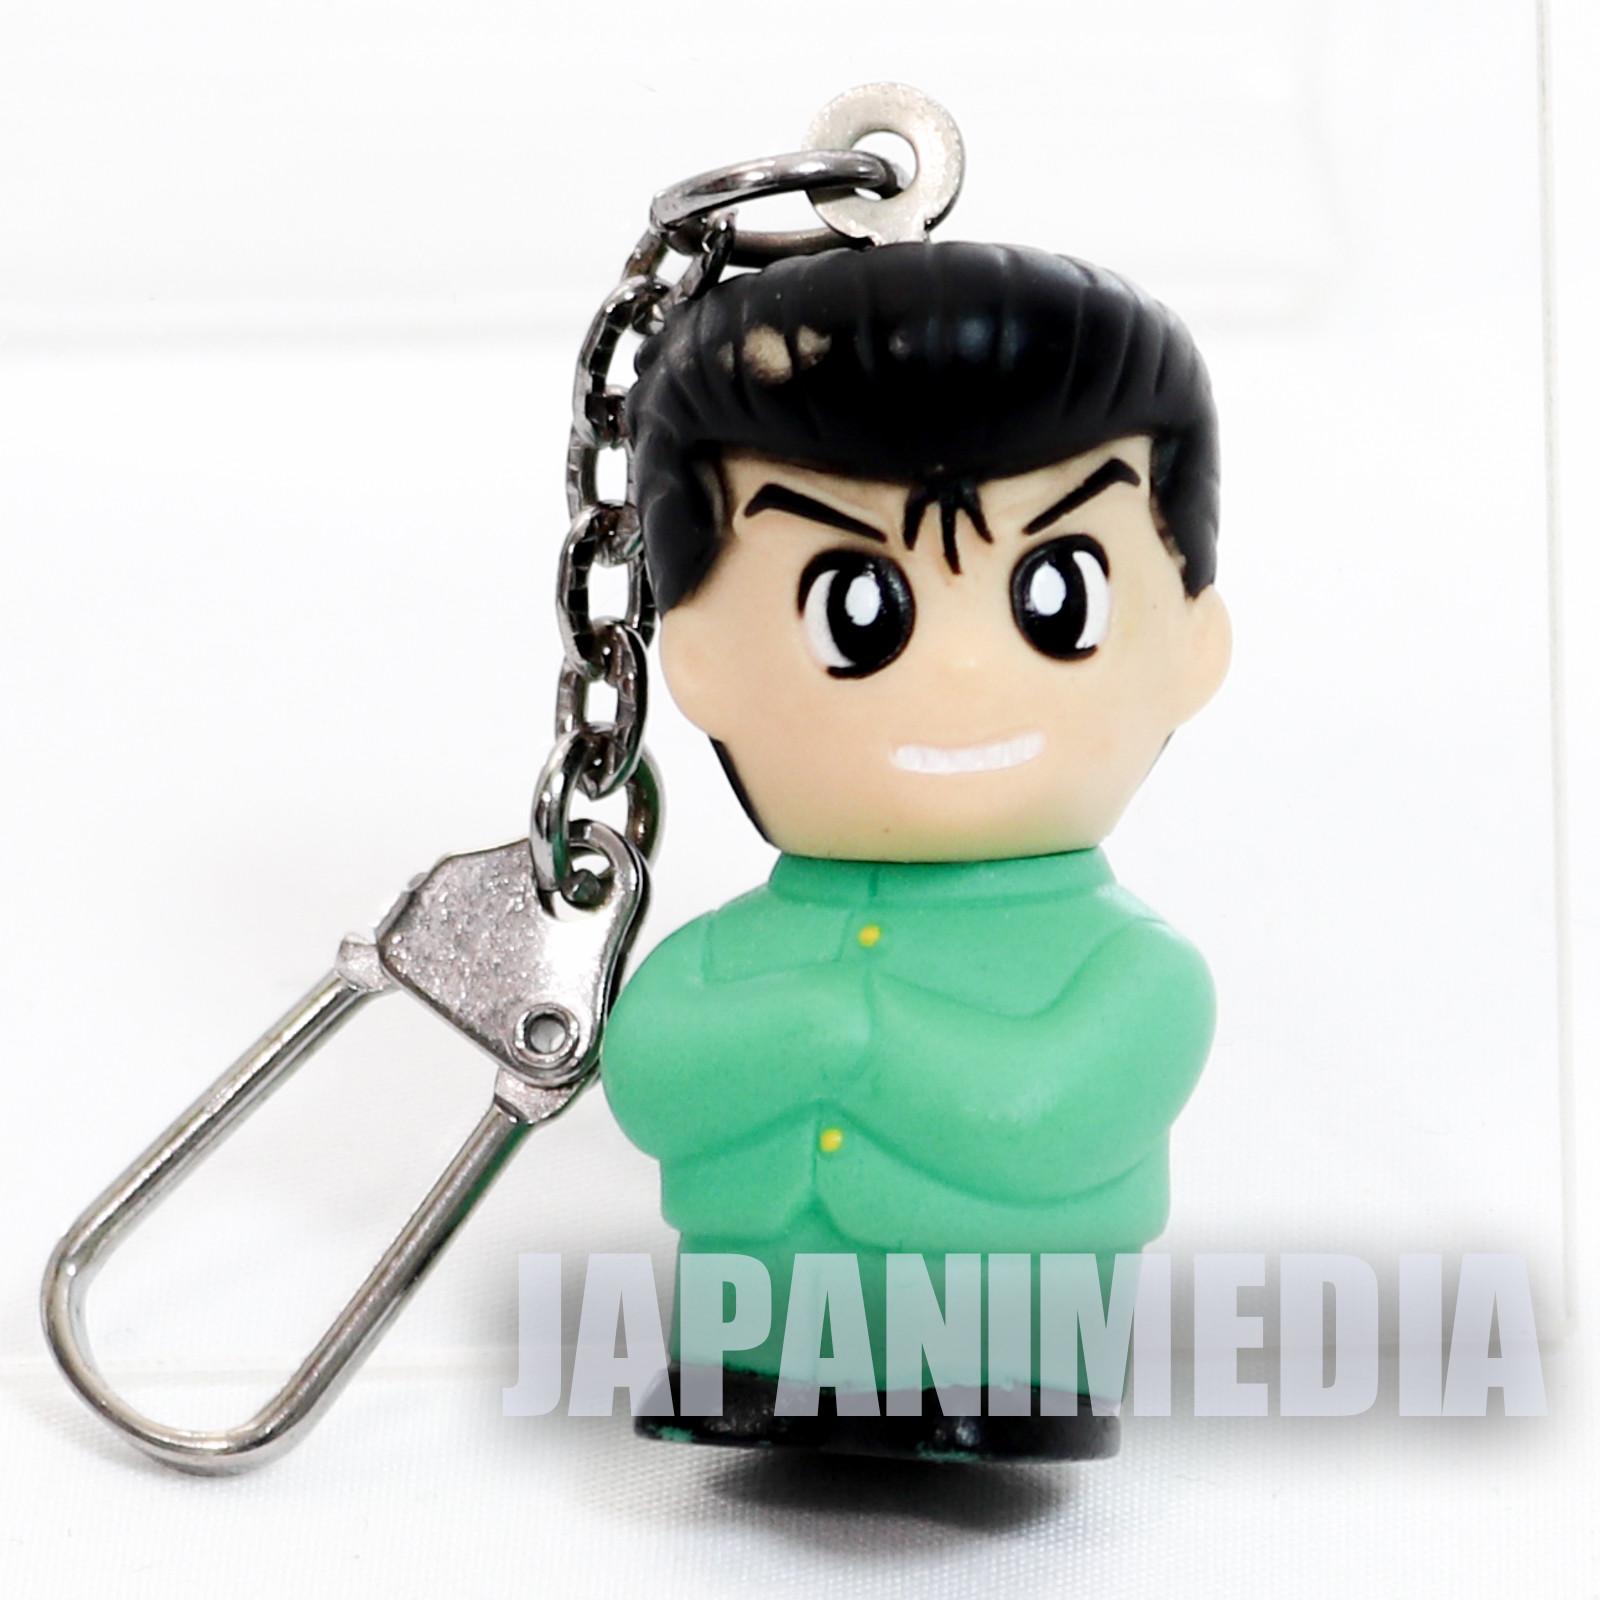 Retro Yu Yu Hakusho Yusuke Urameshi Figure Keychain JAPAN ANIME MANGA